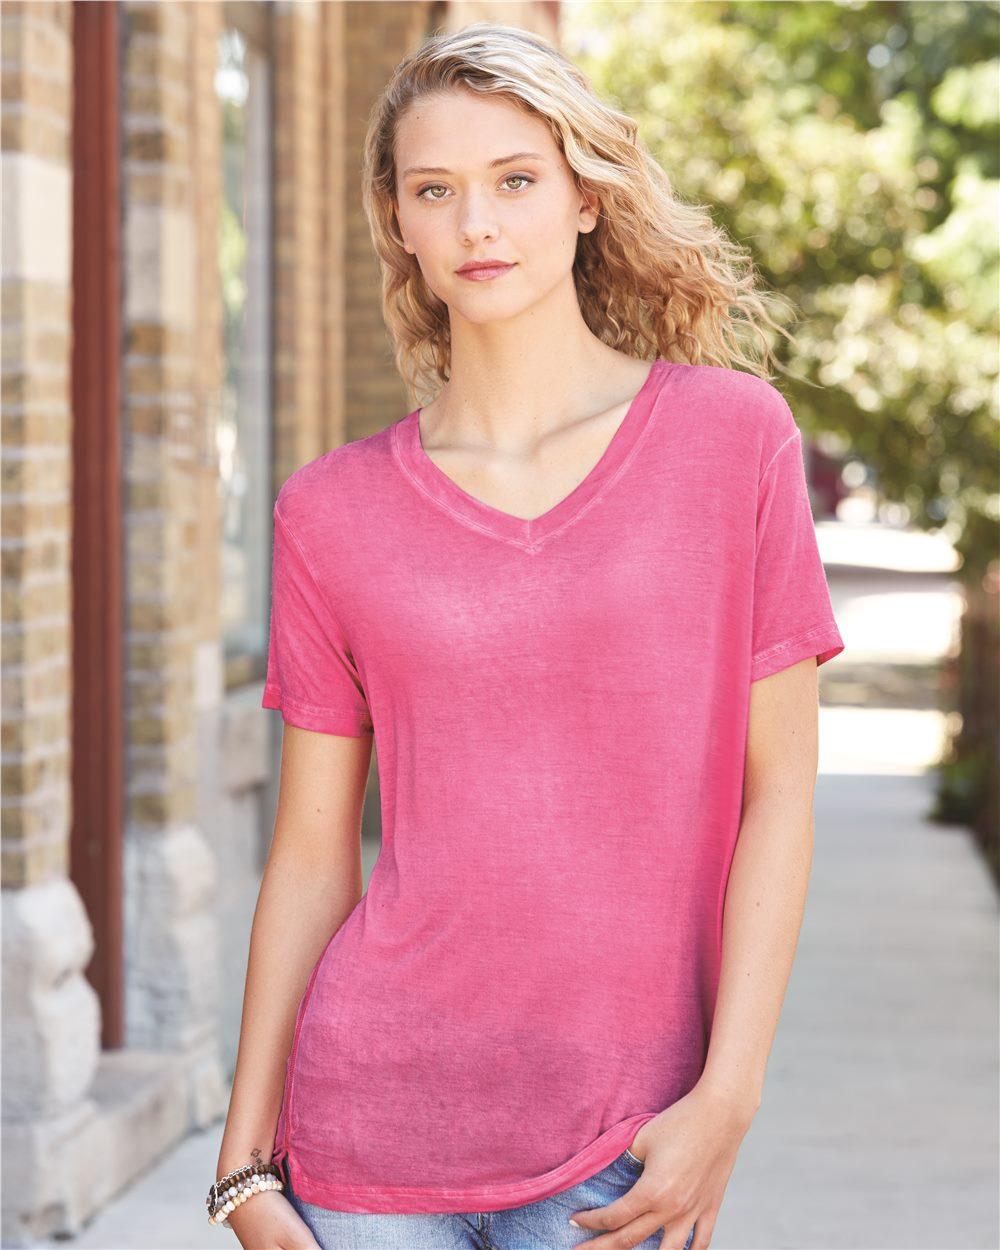 J. America 8132 - Women's Oasis Wash V Neck Tee Shirt